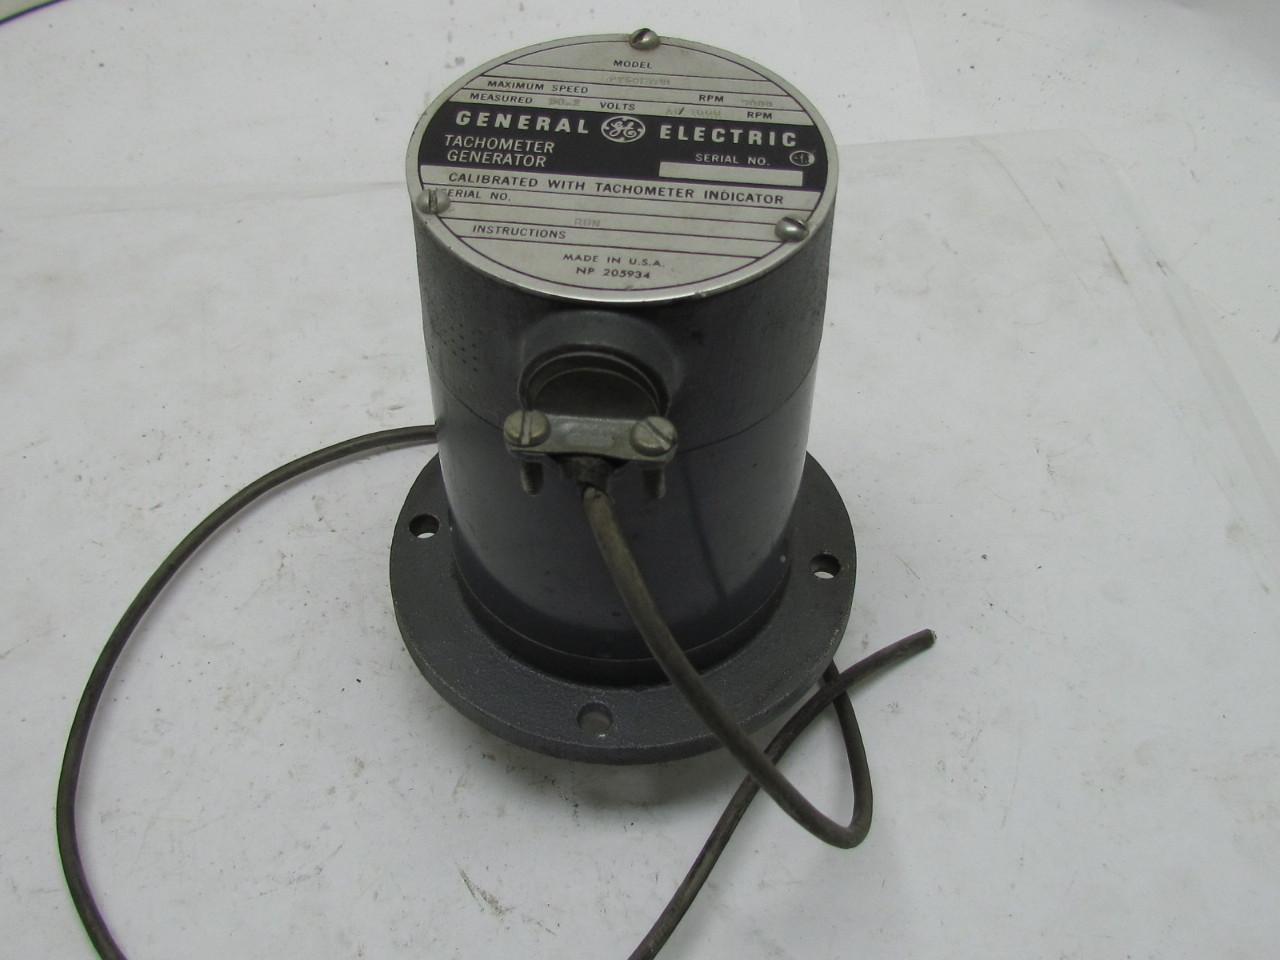 general electric tachometer wiring diagram    general       electric    5py59ey2b    tachometer    generator w 24xlmpb     general       electric    5py59ey2b    tachometer    generator w 24xlmpb